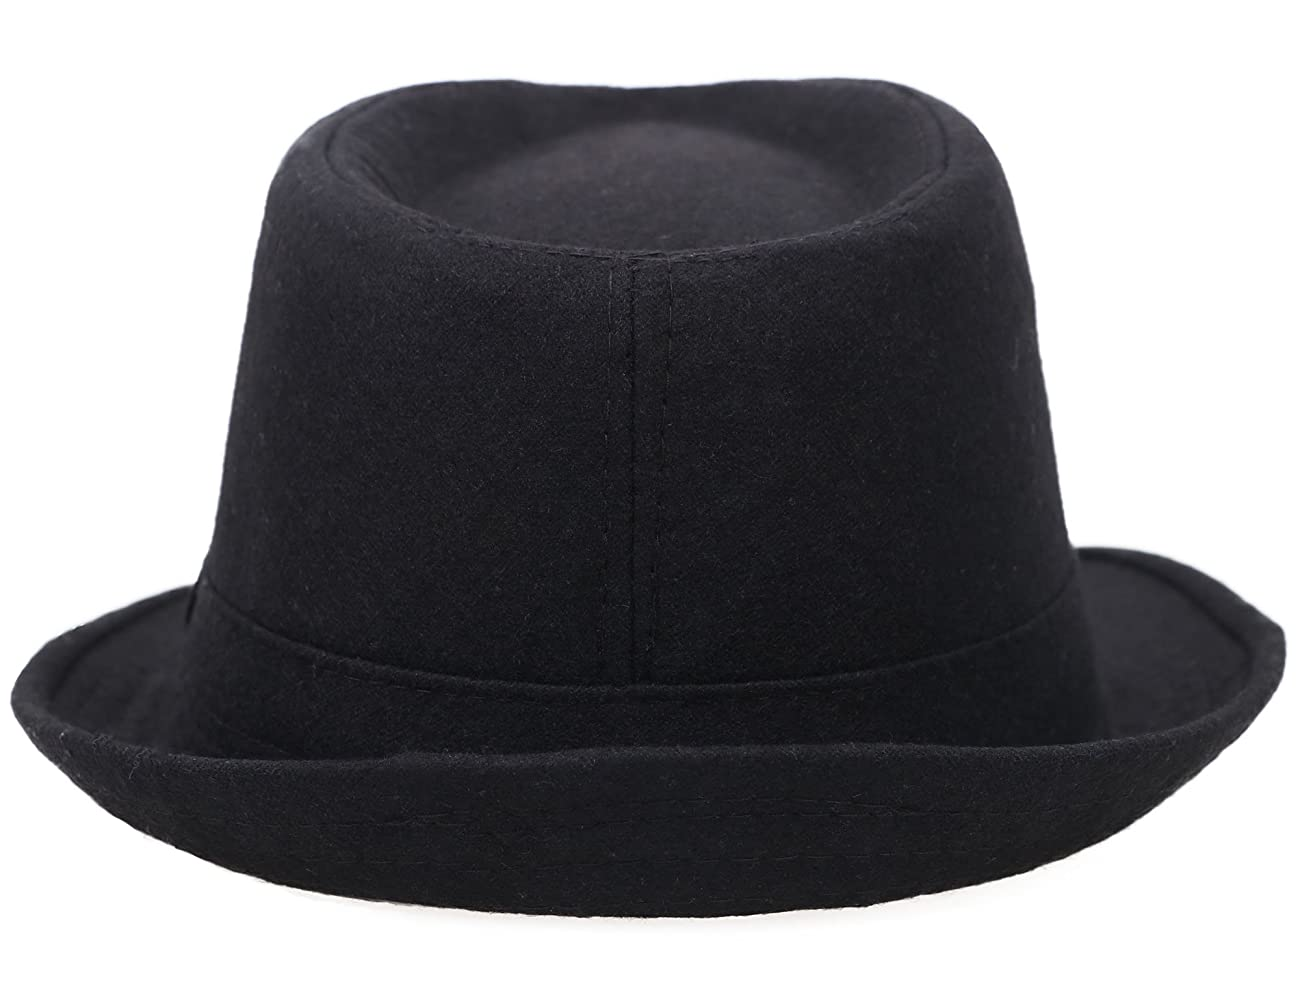 Simplicity Women Men's Fashion Fall / Winter Dapper Fedora Hat w/ Wide Brim 2